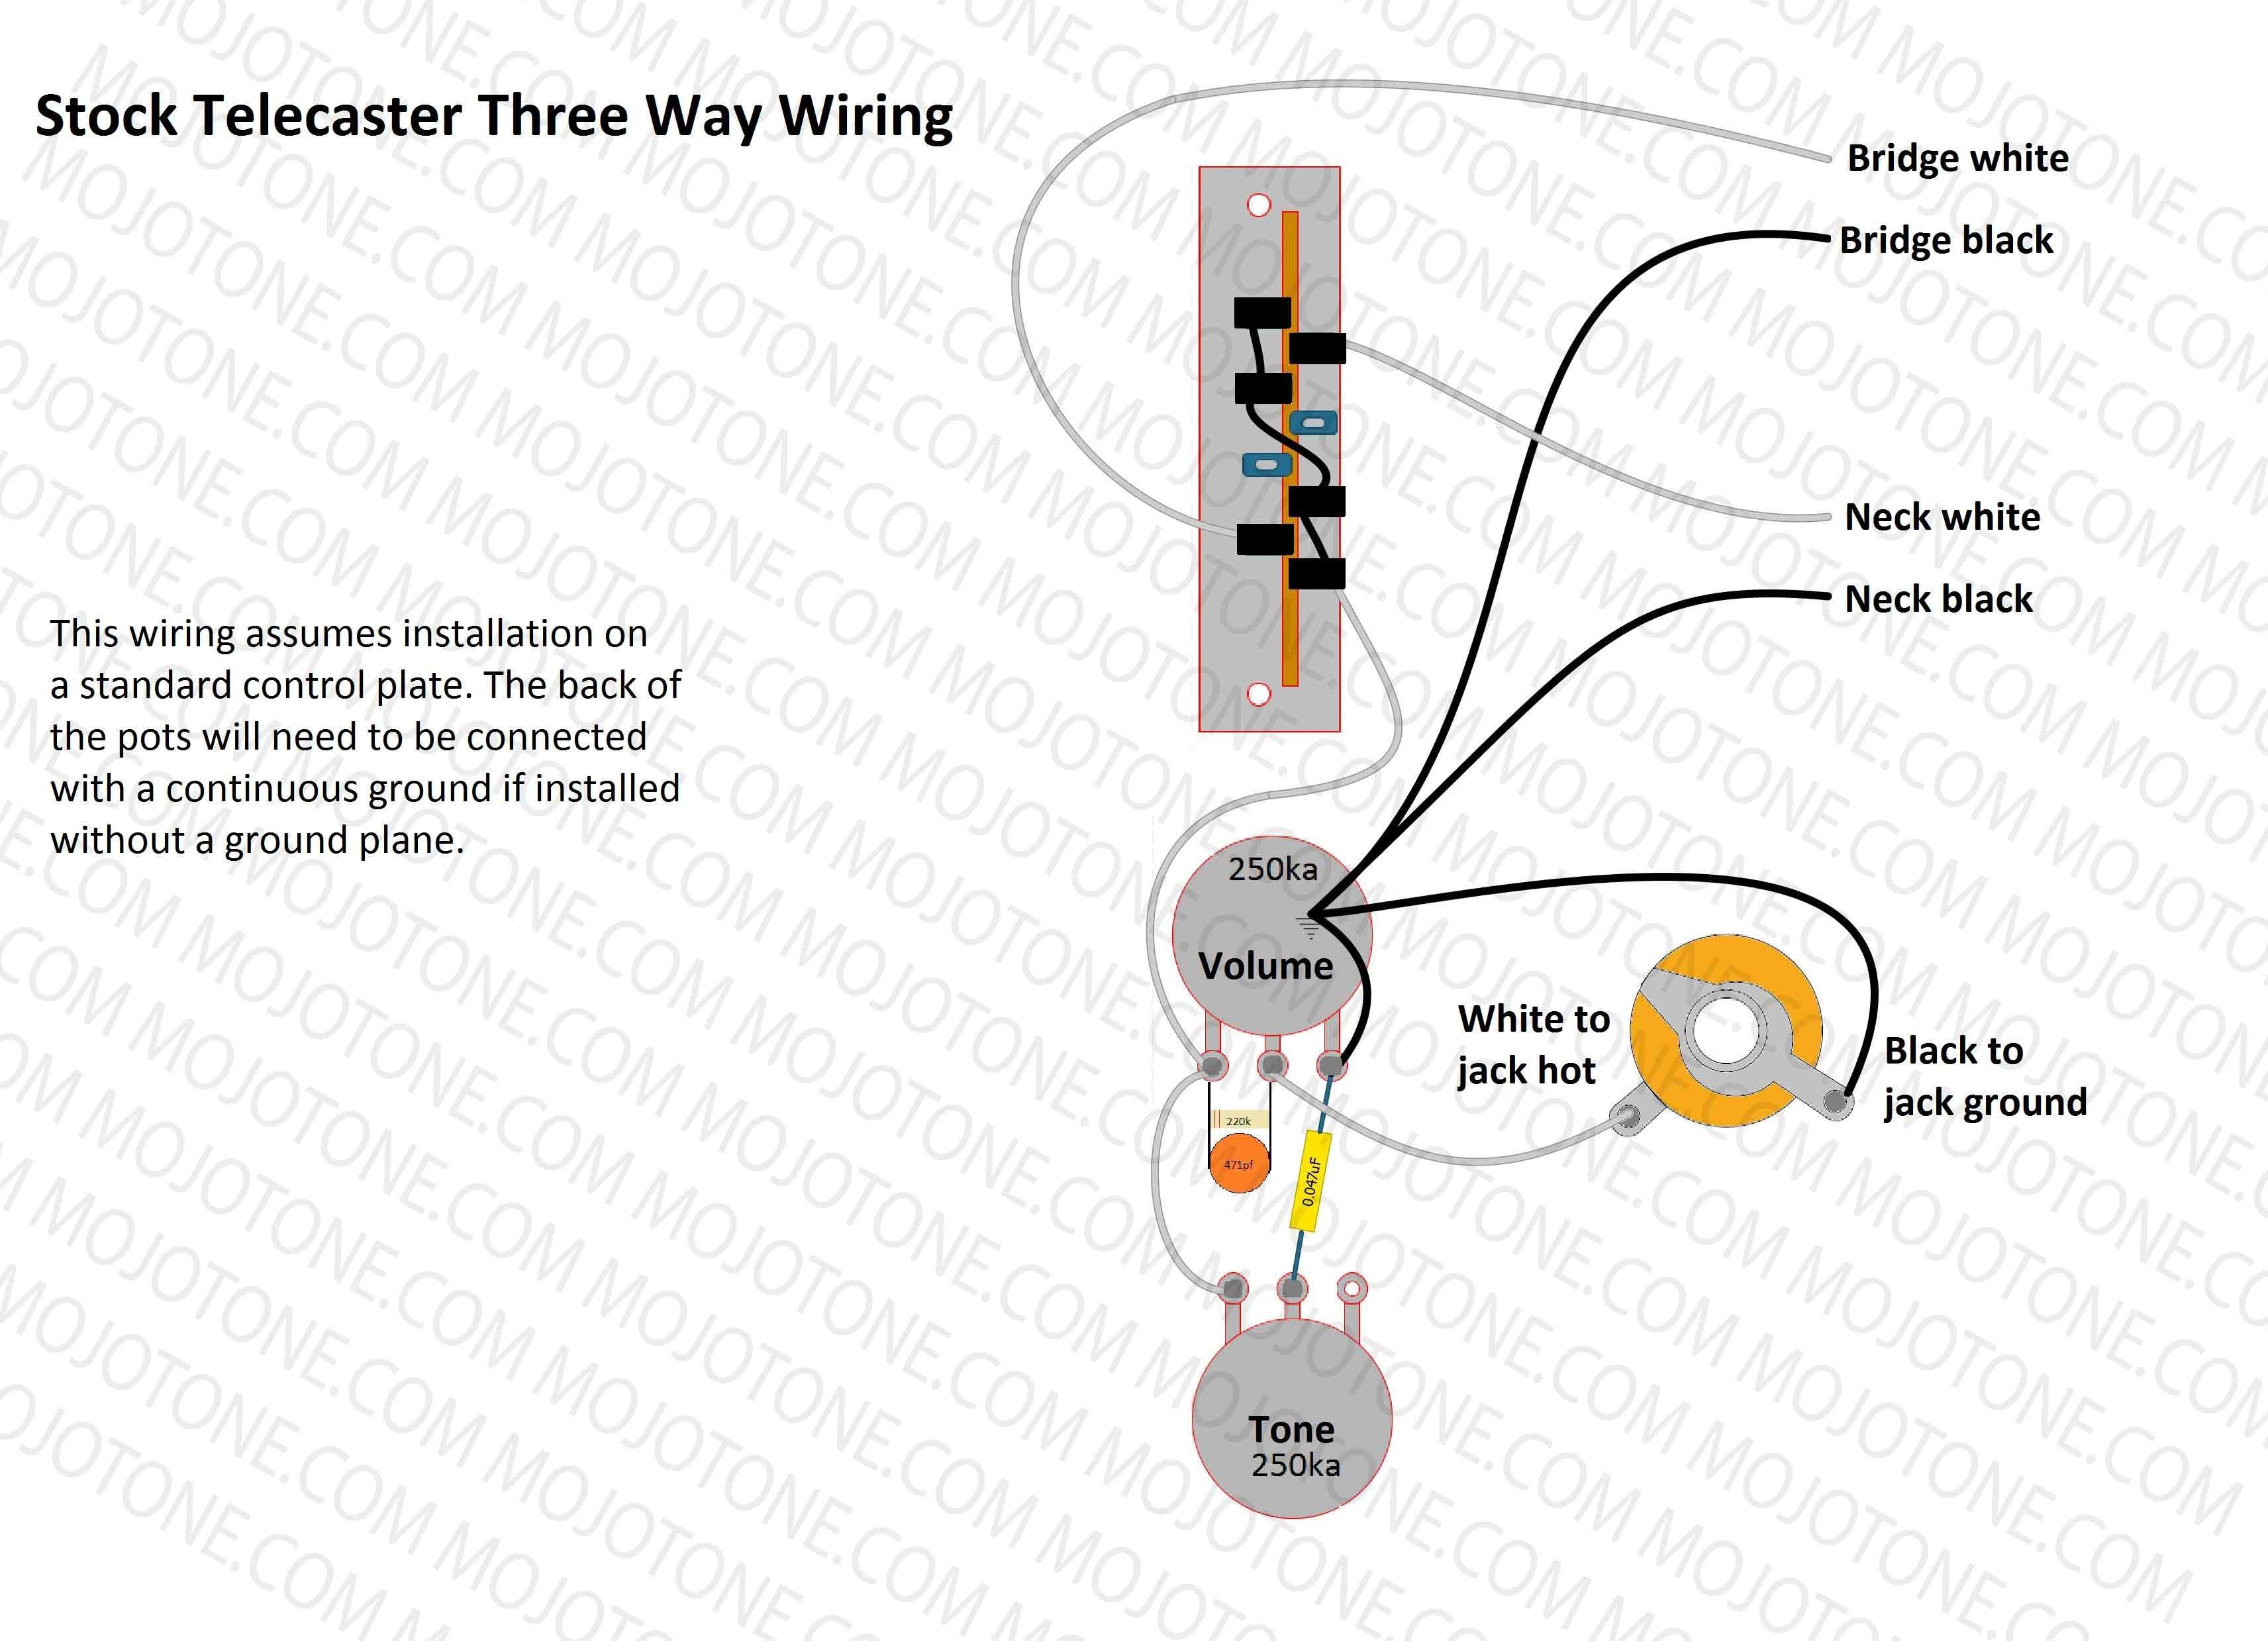 Wiring Diagram Guitar Fender Fresh New Fender Telecaster Wiring Diagram Wiring Wiring